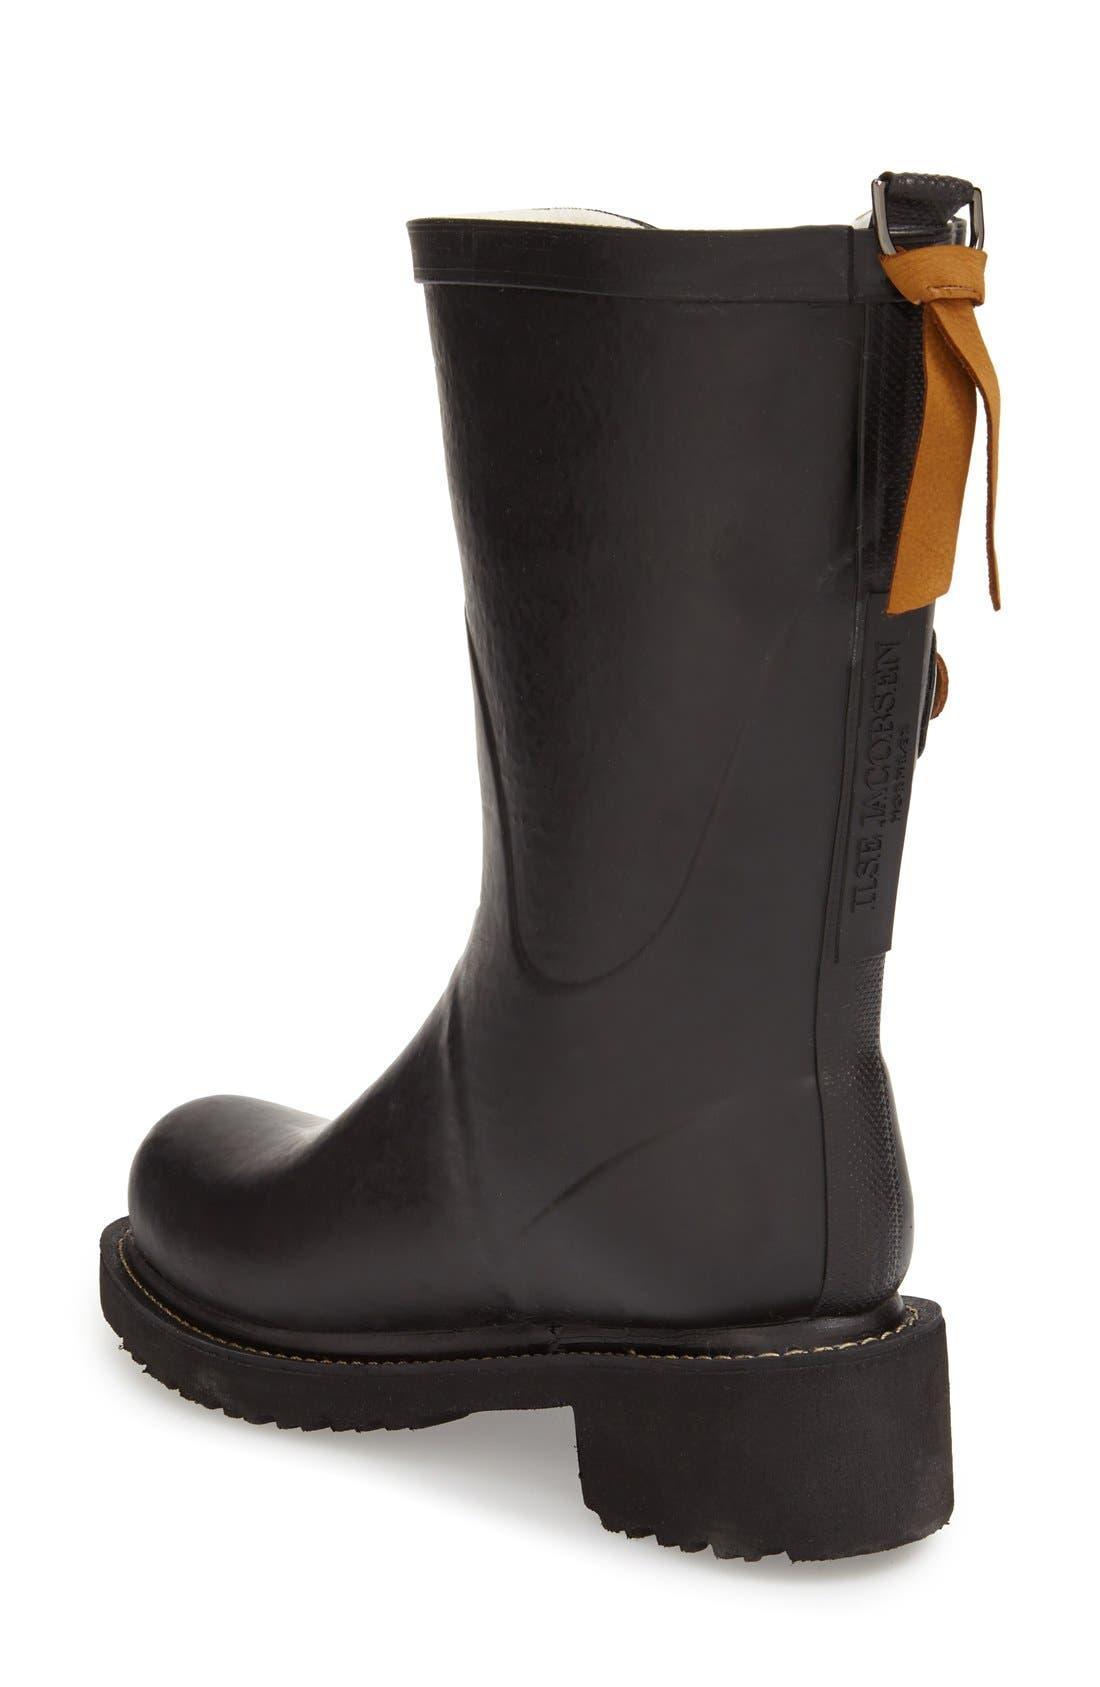 Waterproof Buckle Detail Snow/Rain Boot,                             Alternate thumbnail 2, color,                             BLACK